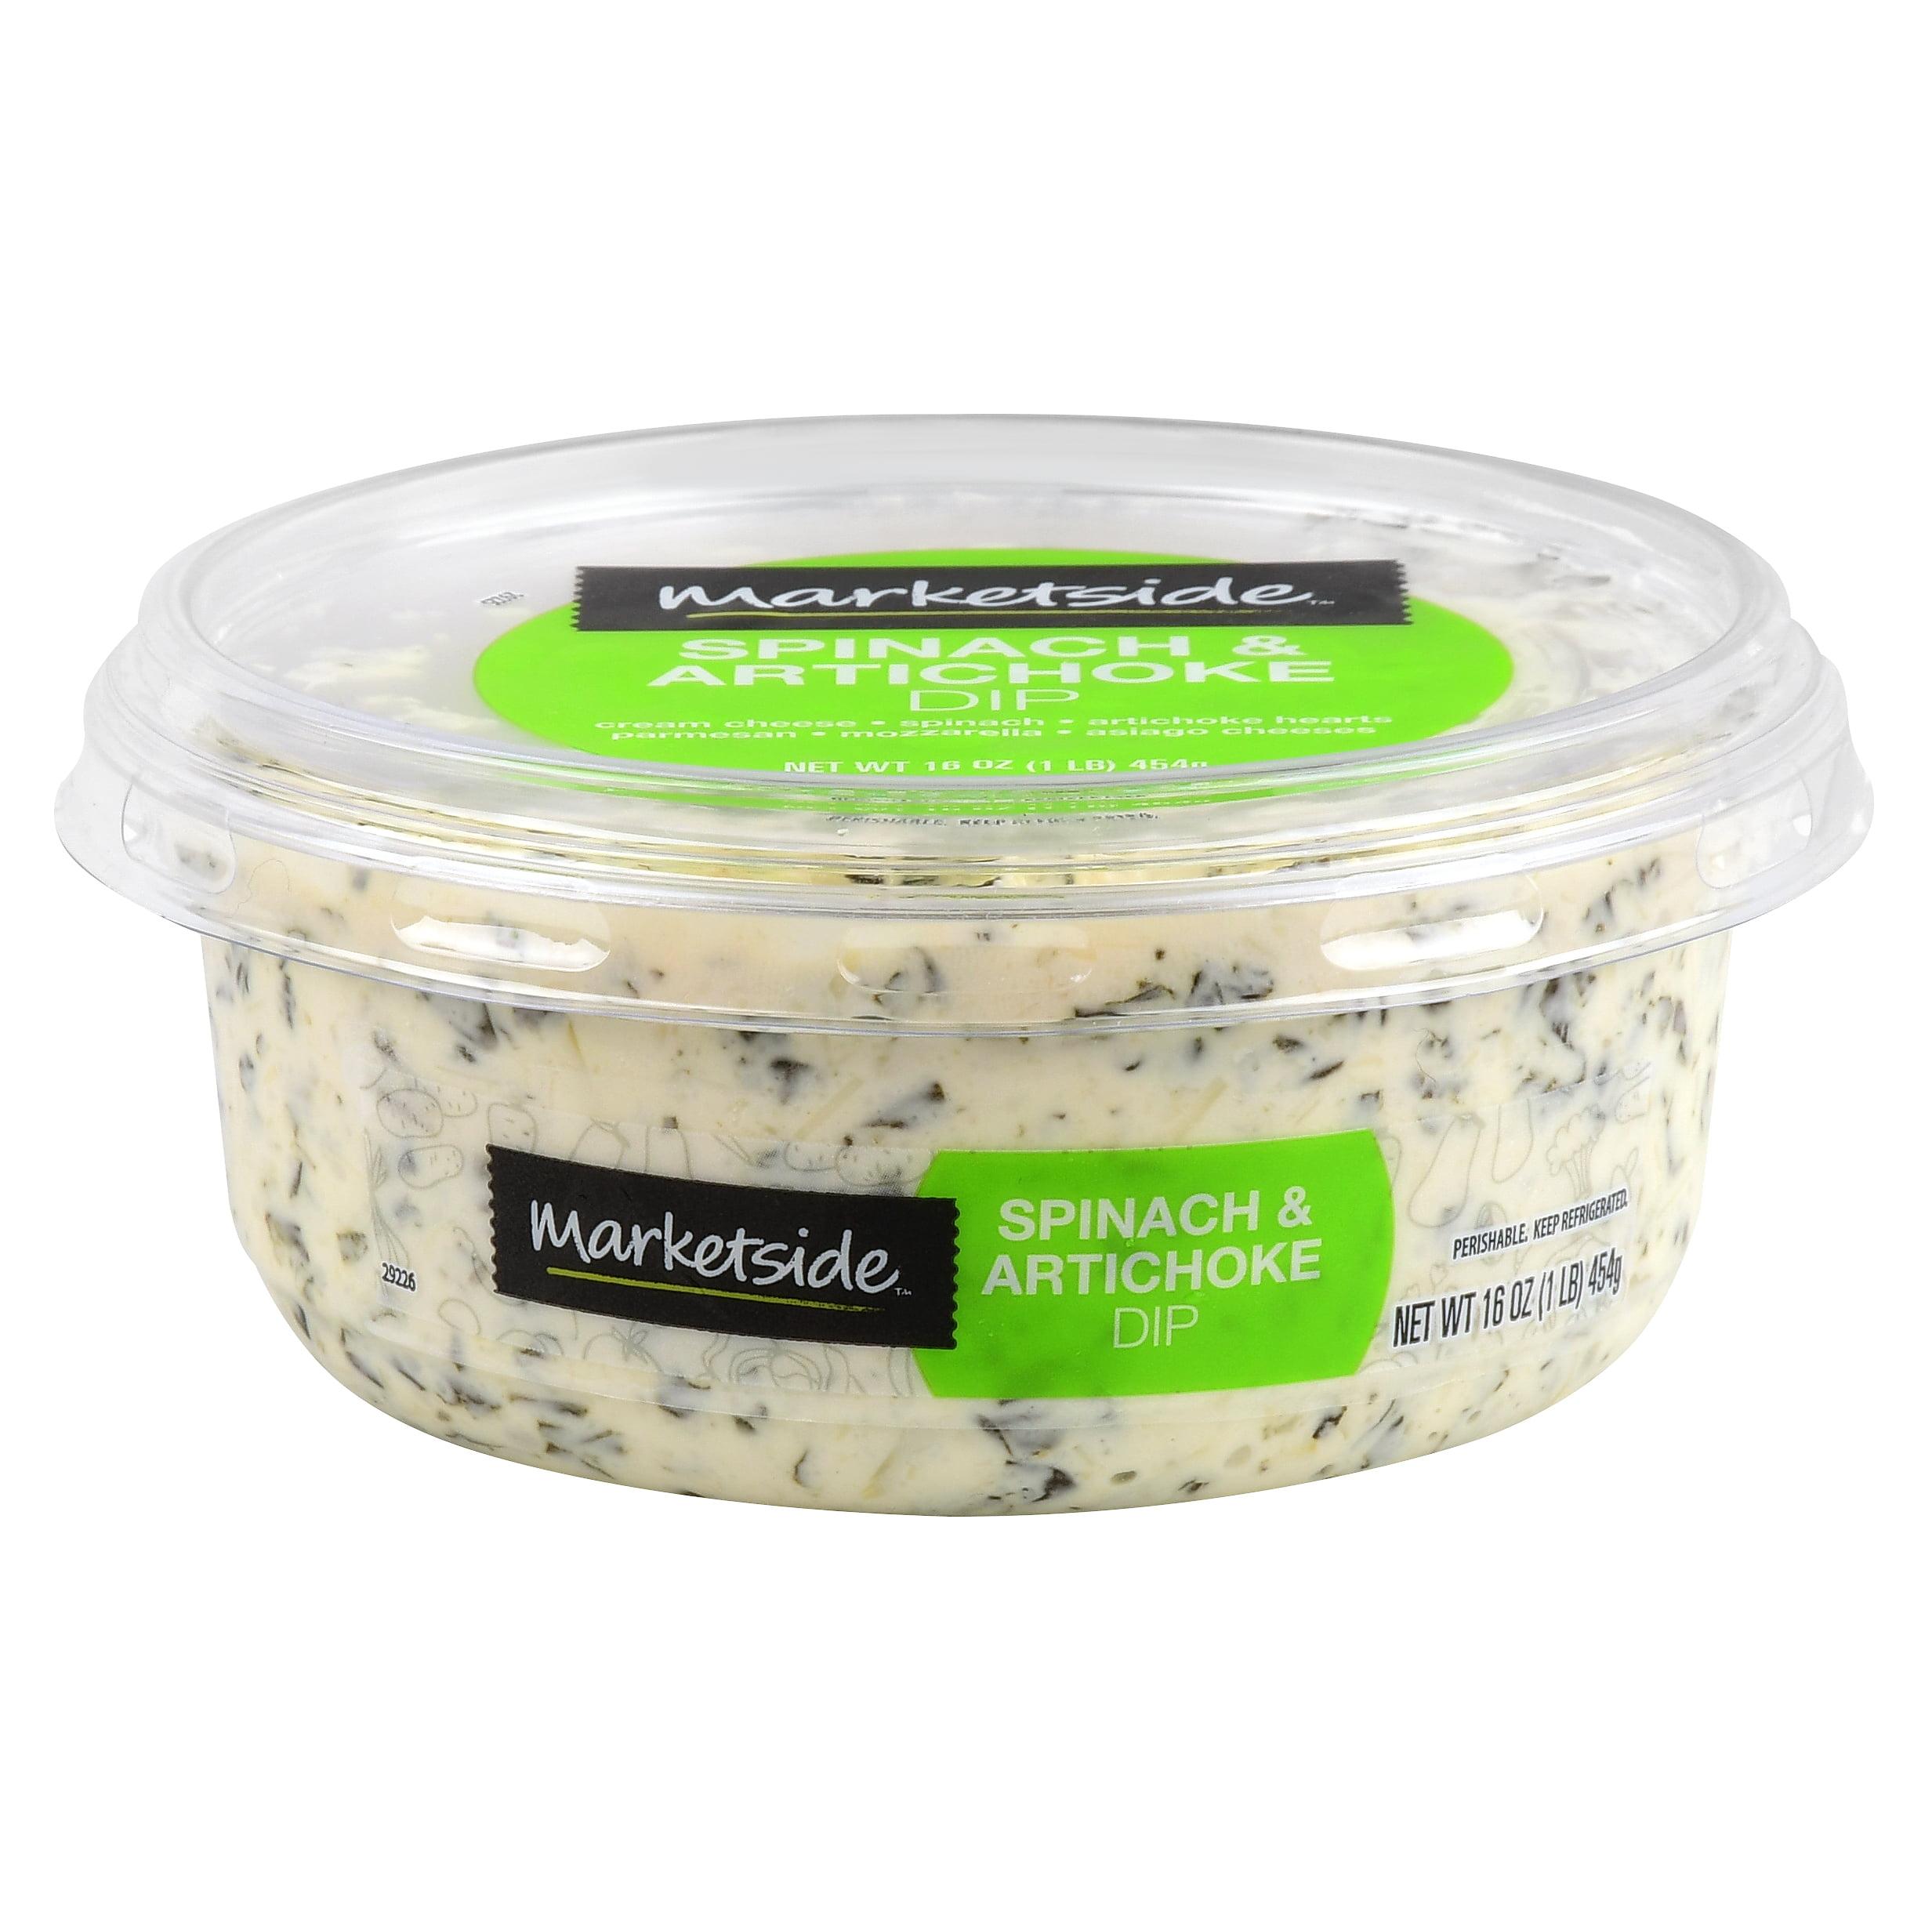 Marketside Spinach Artichoke Dip 16 Oz Walmart Com Walmart Com